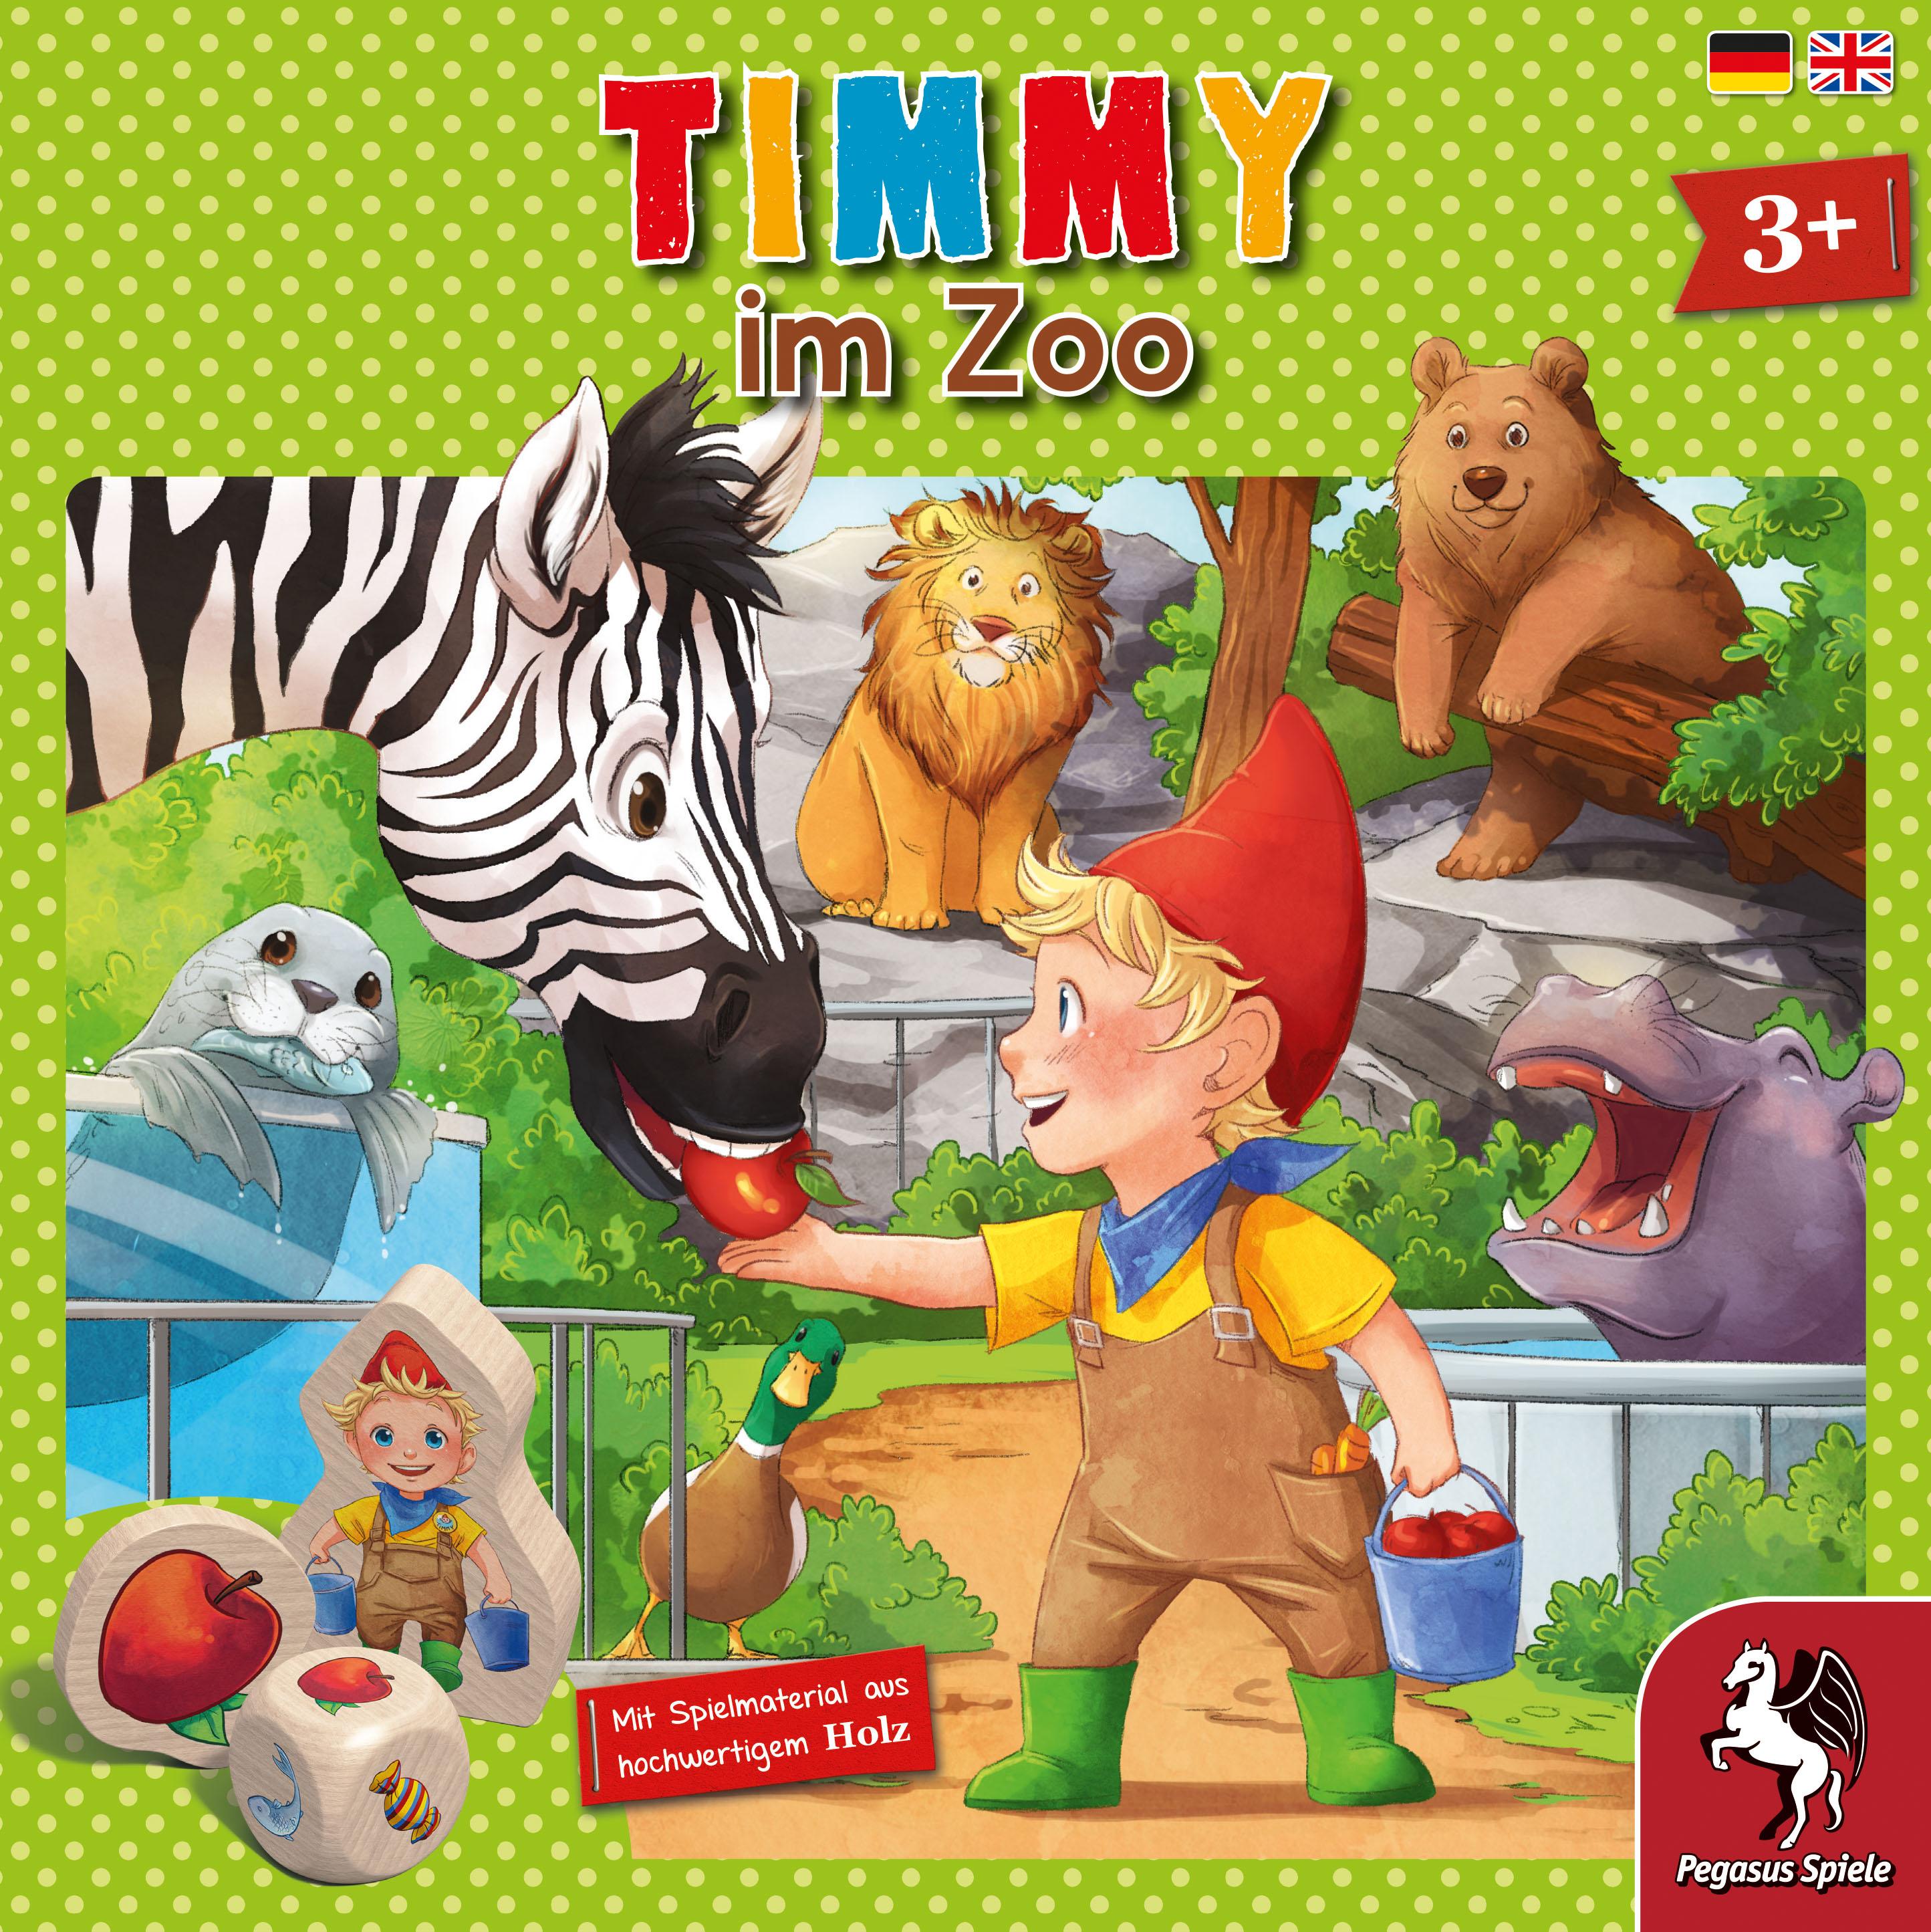 Timmy im Zoo | Timmy | Themengebiete | Games | Pegasus.de - Playing is  passion!